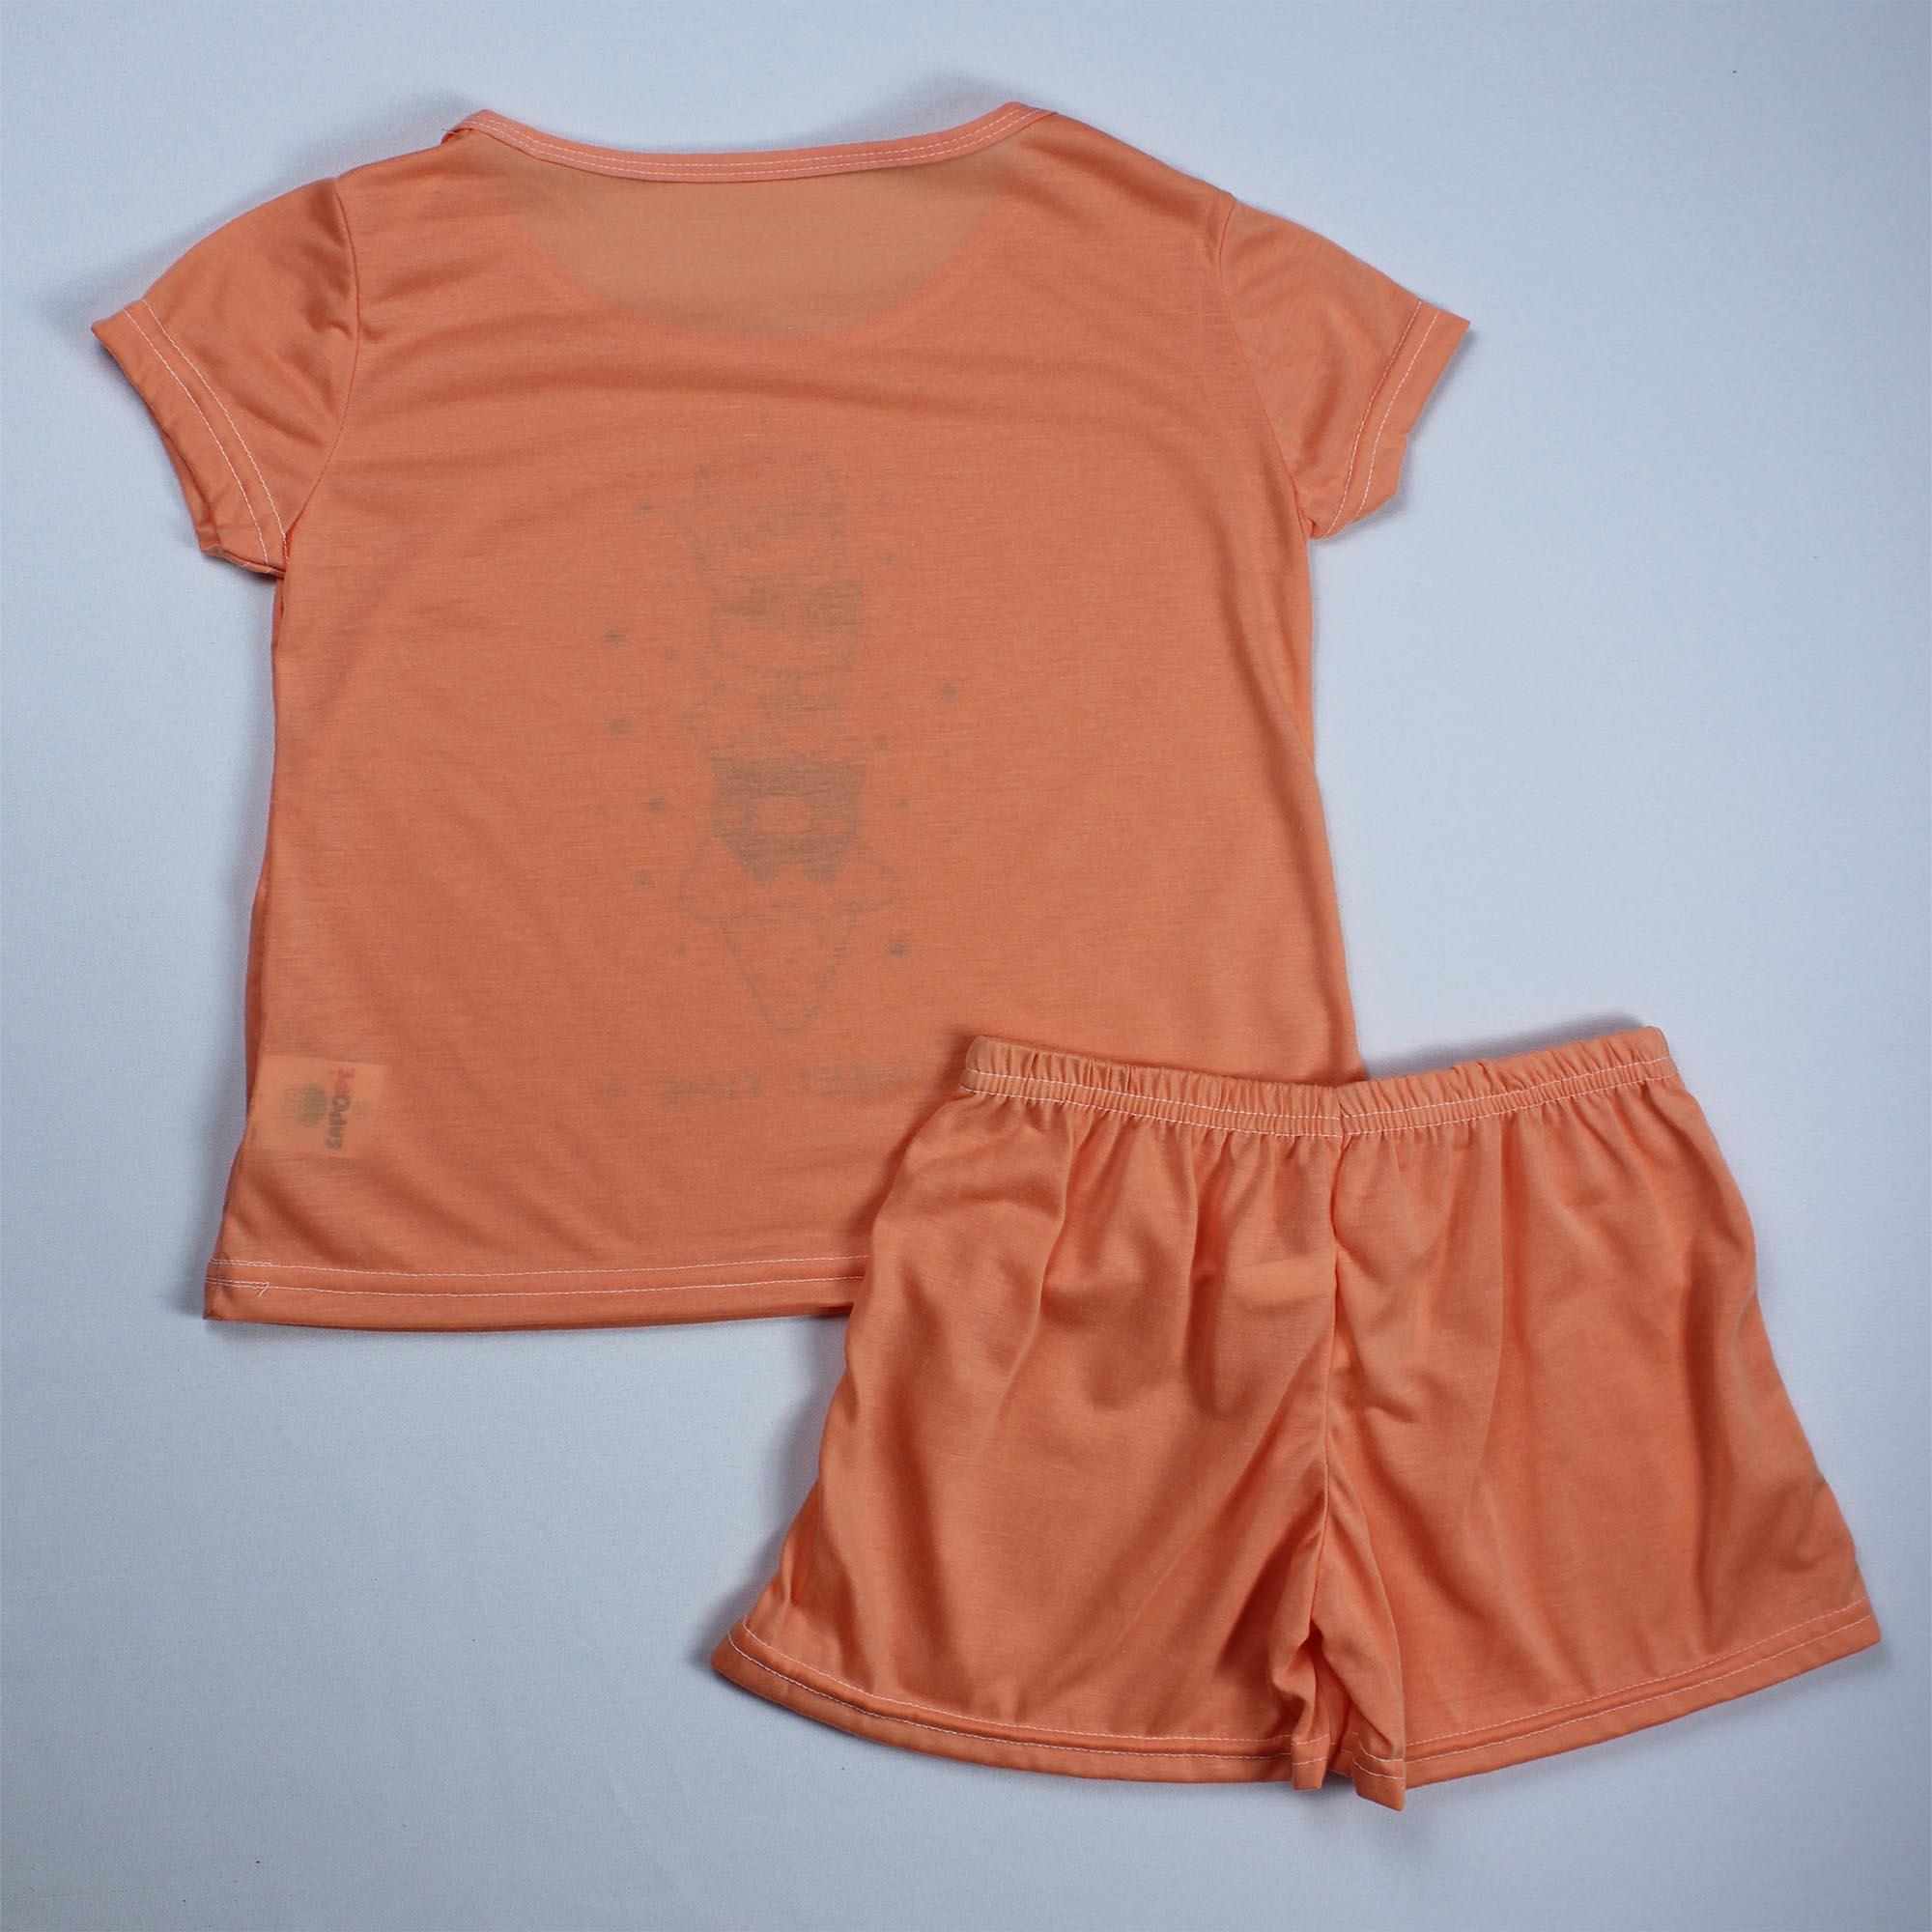 Pijama Infantil Menina - Tamanho 10